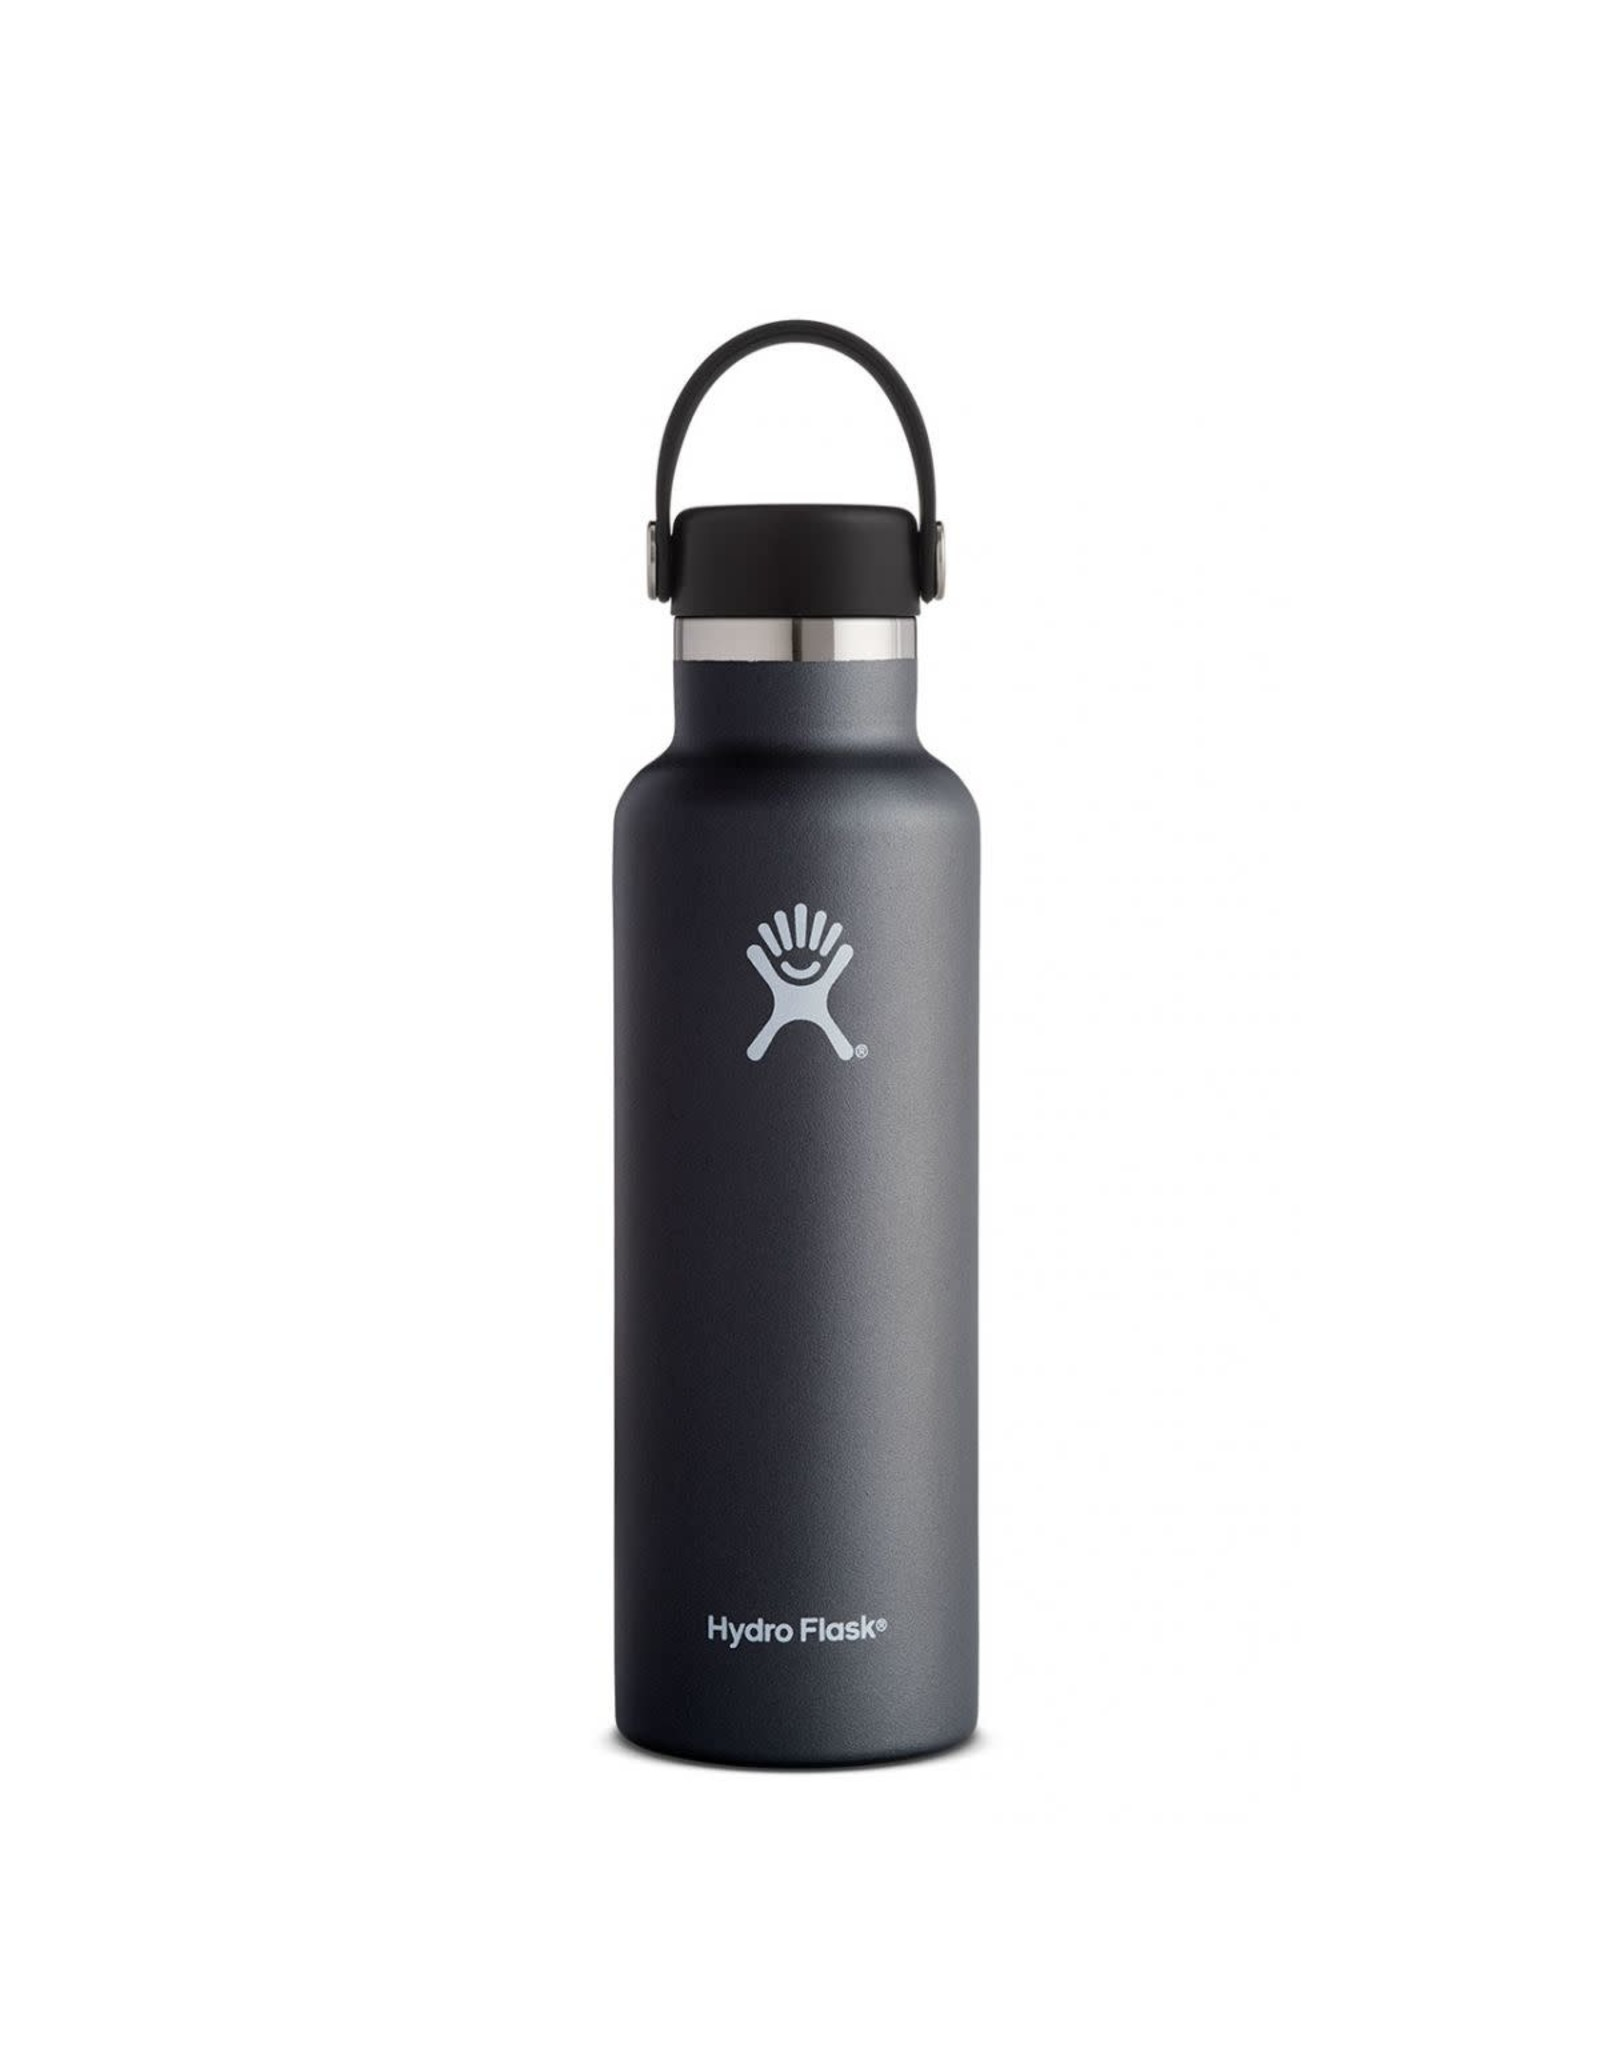 Hydro Flask Hydro Flask 21oz Standard Mouth w/ Flex Cap Black